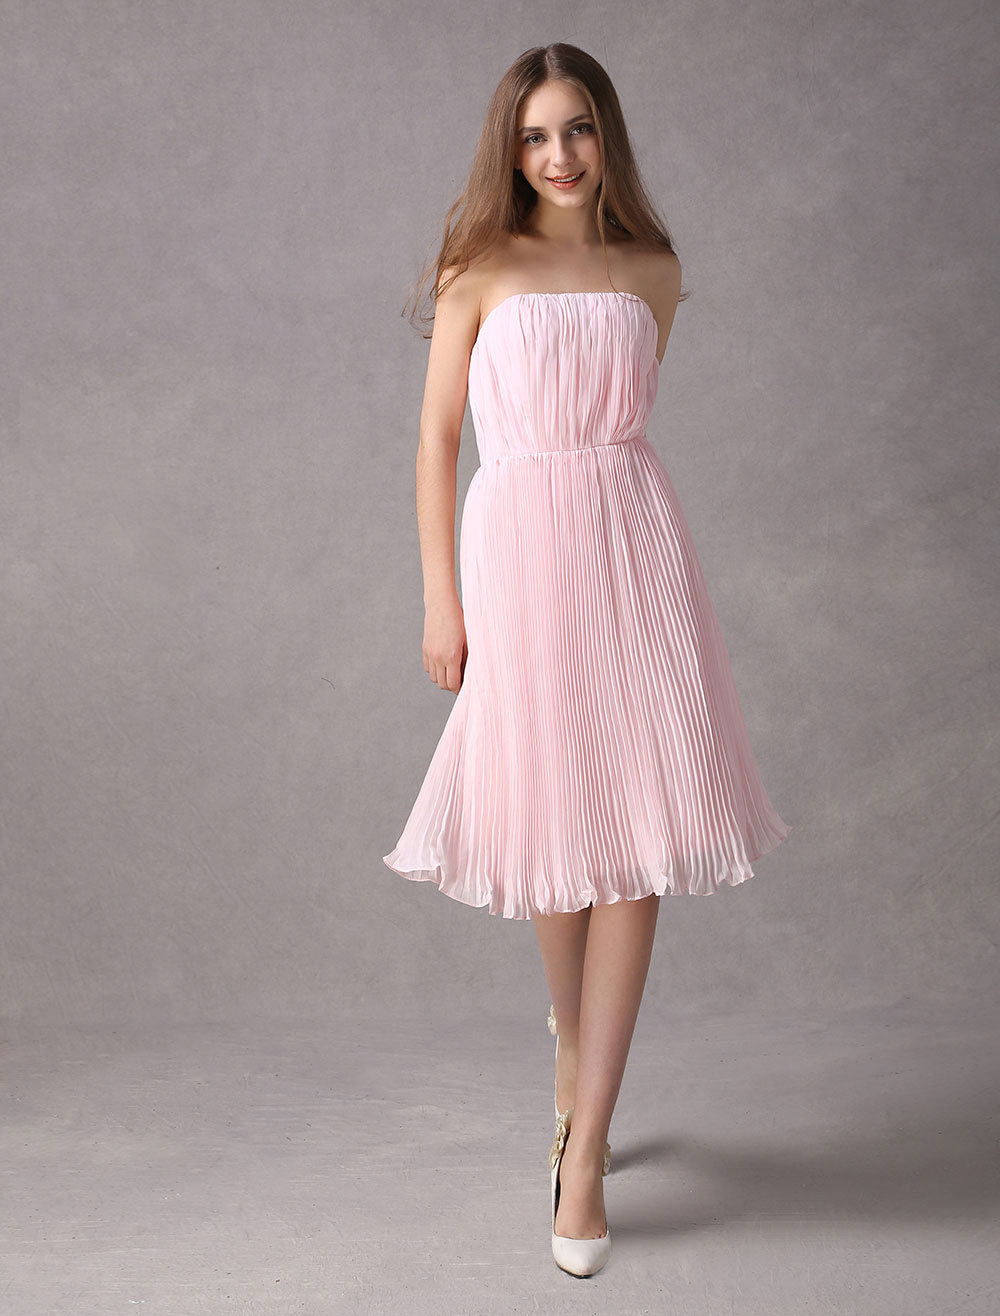 Pink Strapless Knee Length Draped Chiffon Bridesmaid Dress (Wedding Bridesmaid Dresses) photo